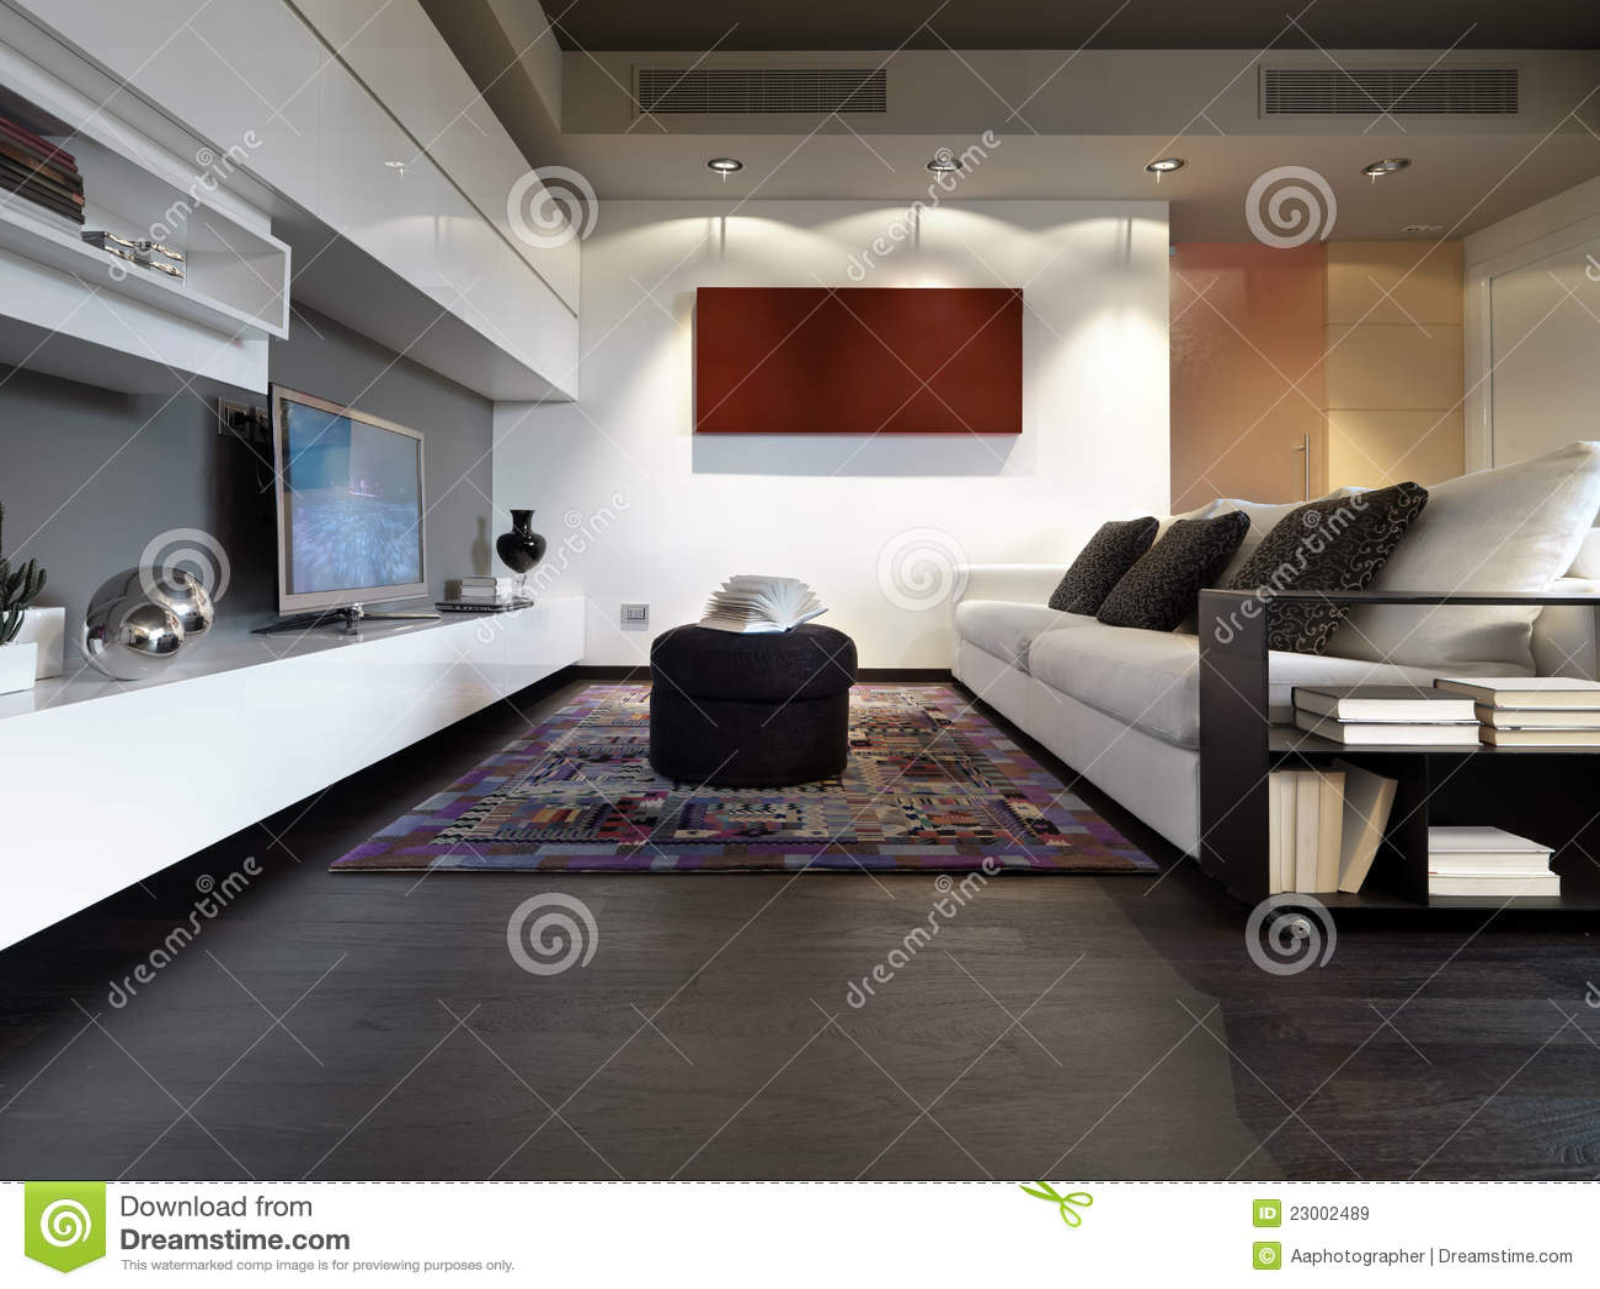 Moderne woonkamer royalty vrije stock afbeeldingen beeld 23002489 for Moderne woonkamer